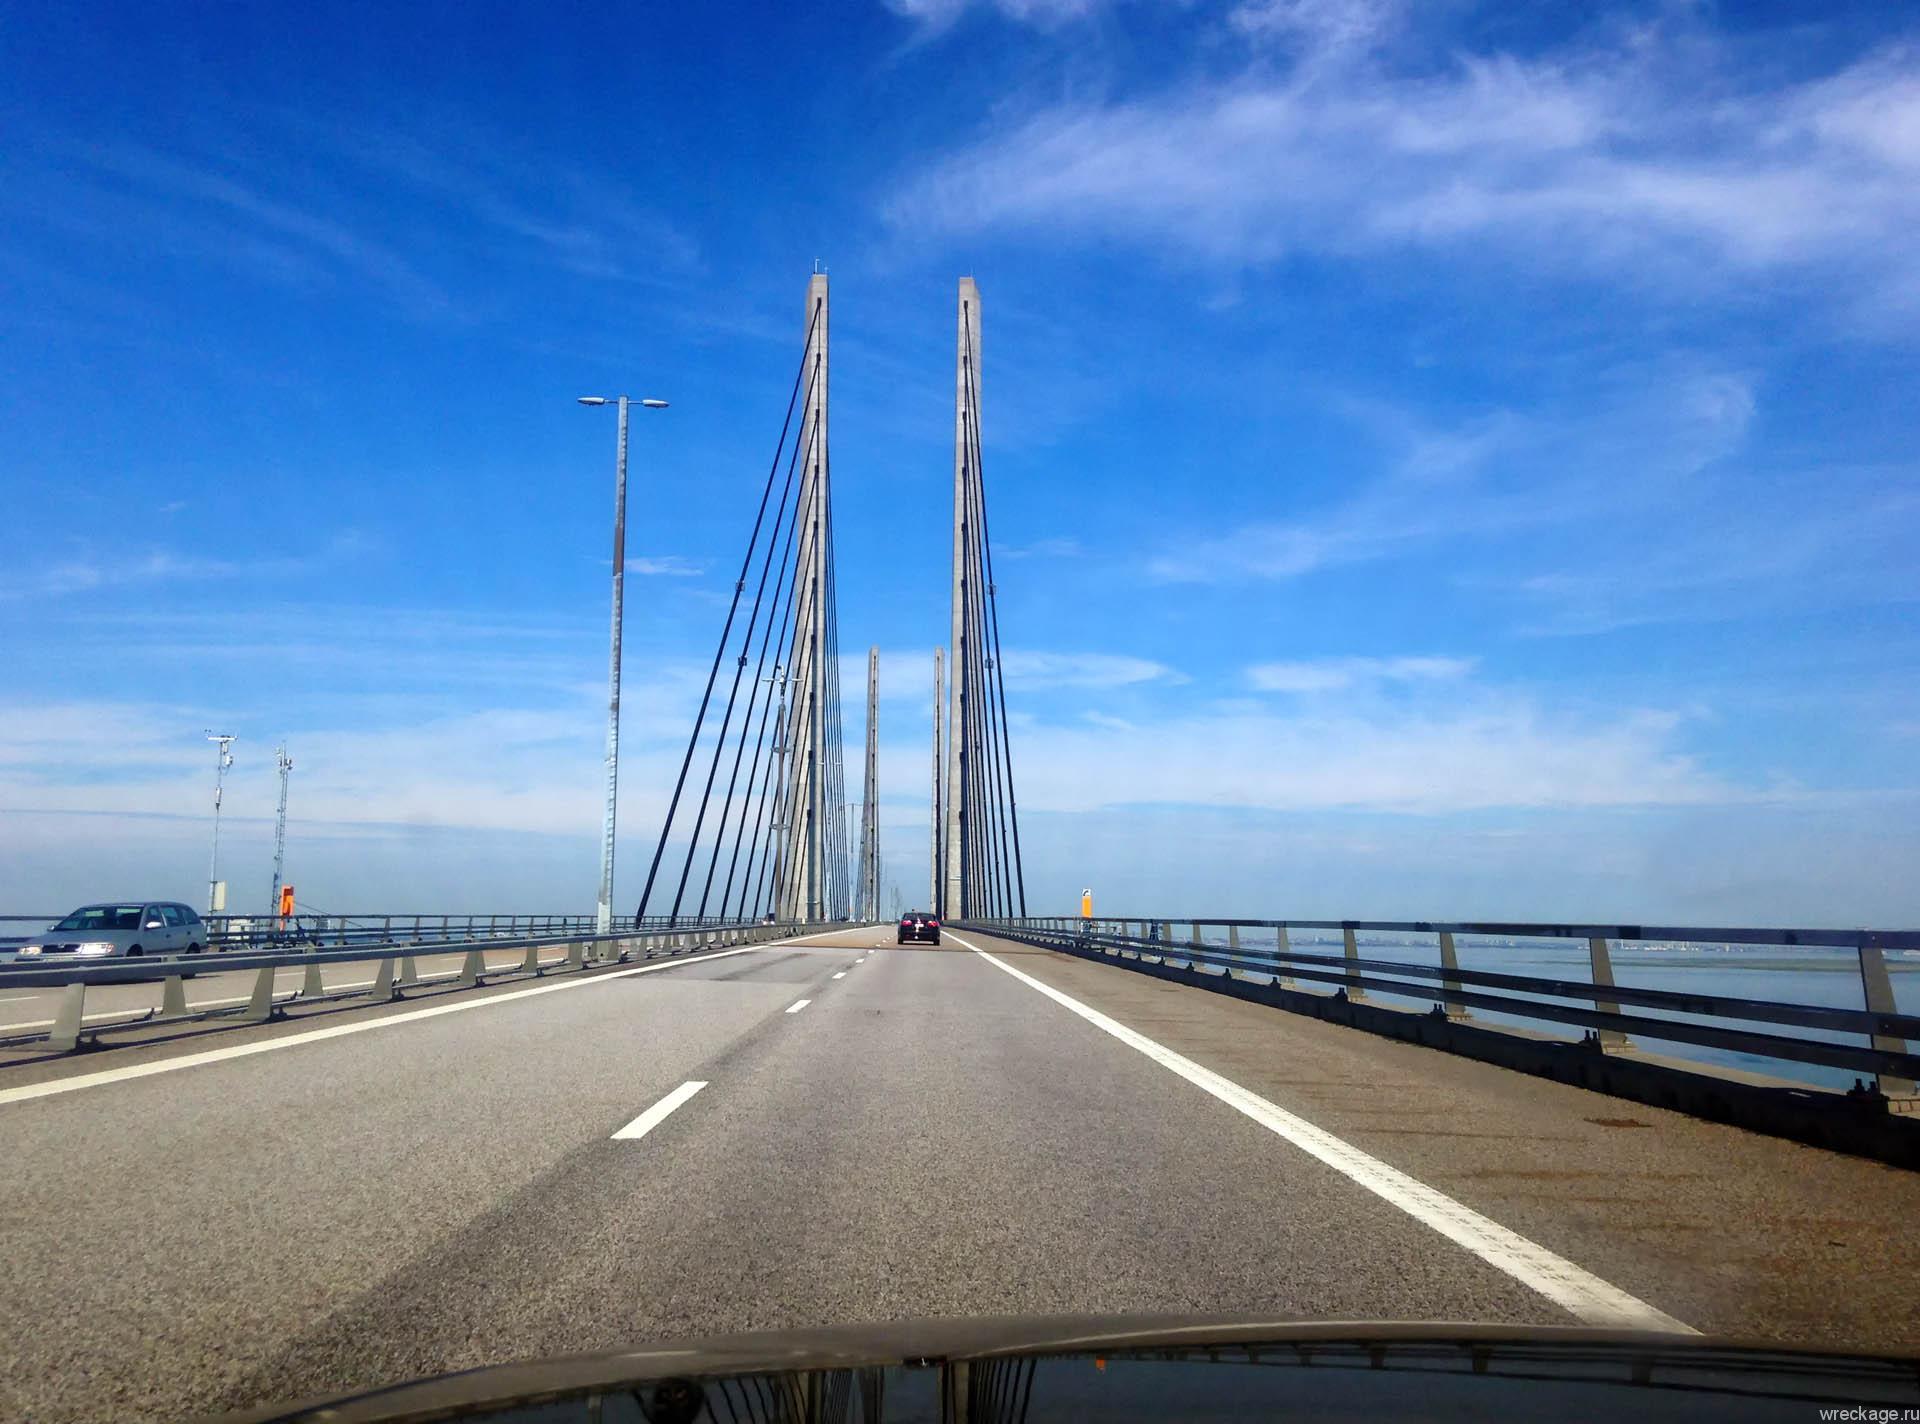 Мост Эресунн. Паркуемся в Копенгагене